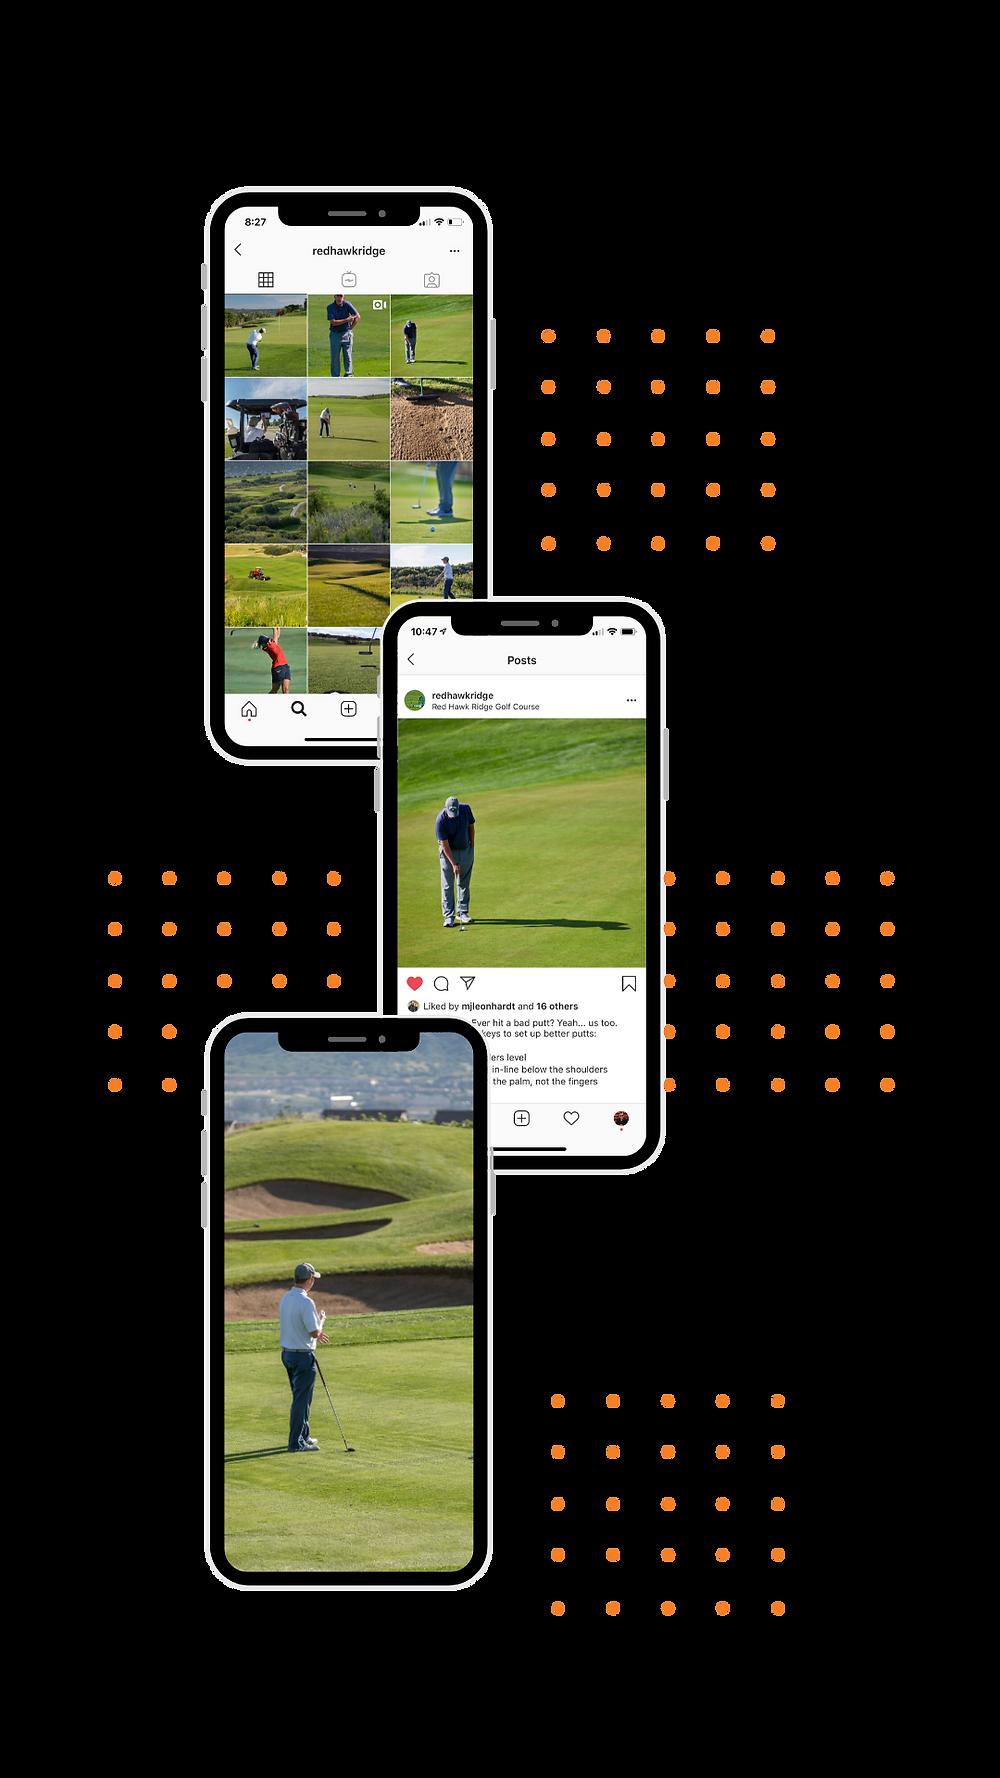 Golf Course Social Media Marketing - Content